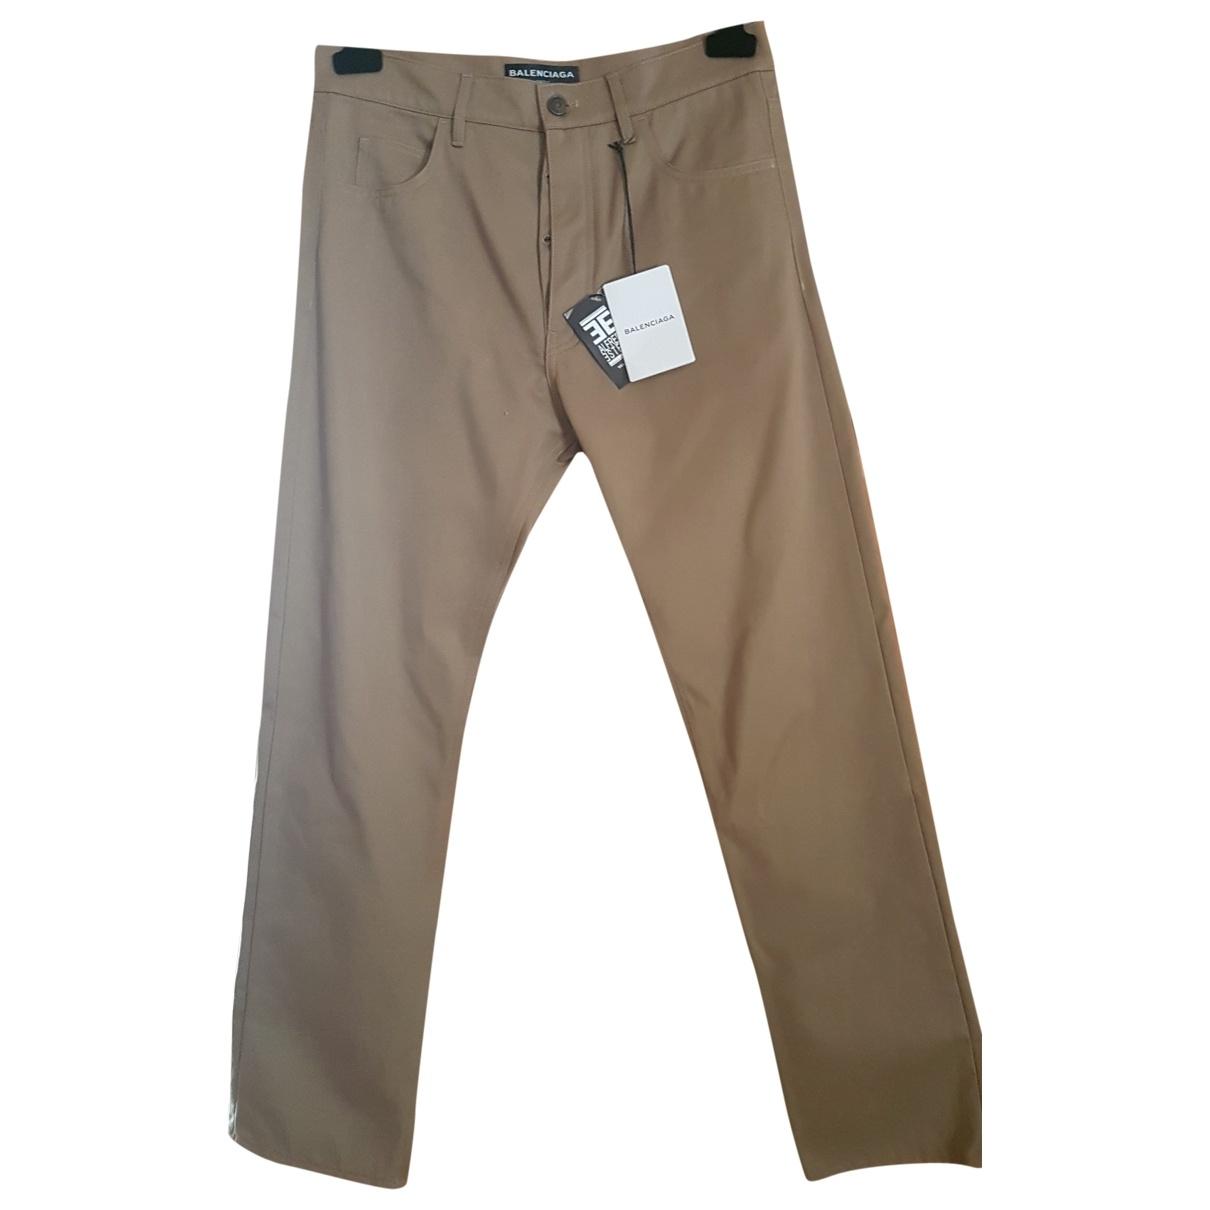 Balenciaga \N Beige Cotton Trousers for Men M International